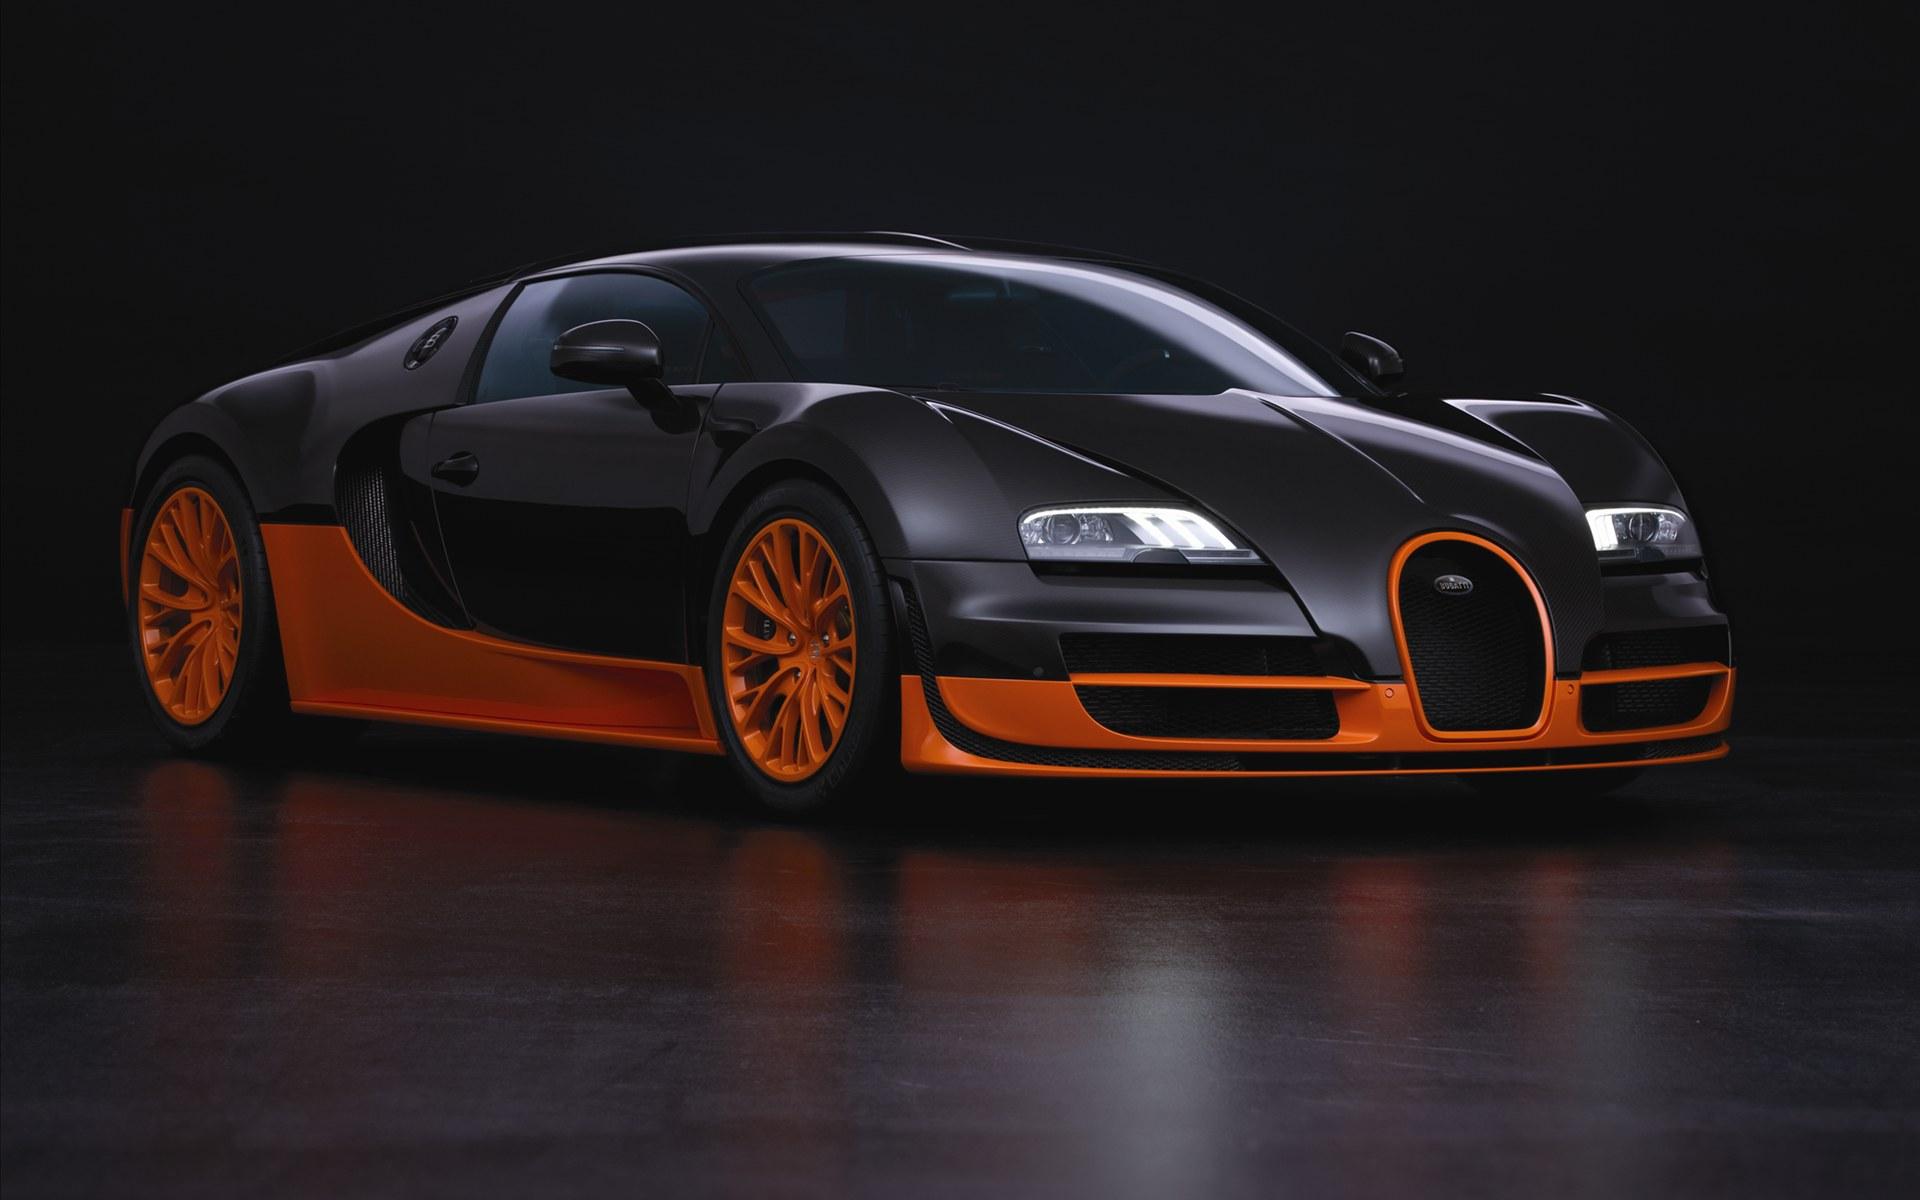 Bugatti Veyron Wallpaper Widescreen 5600 Hd Wallpapers in Cars 1920x1200